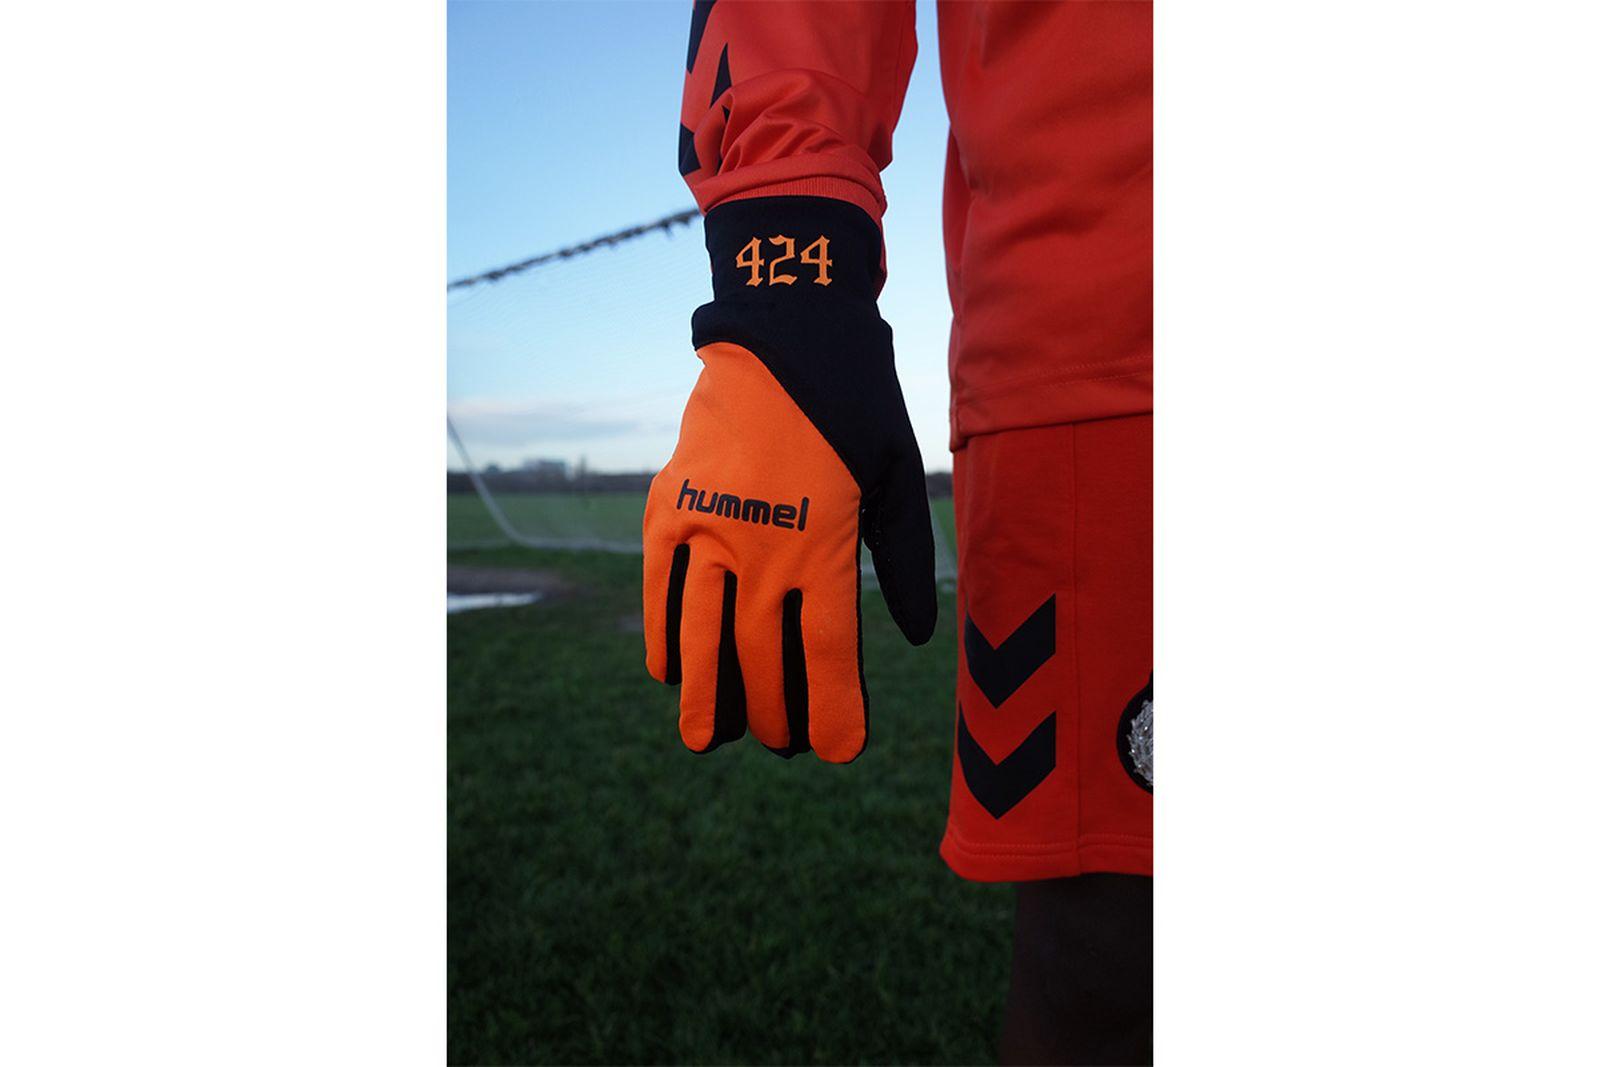 hummel-424-soccer-capsule-09